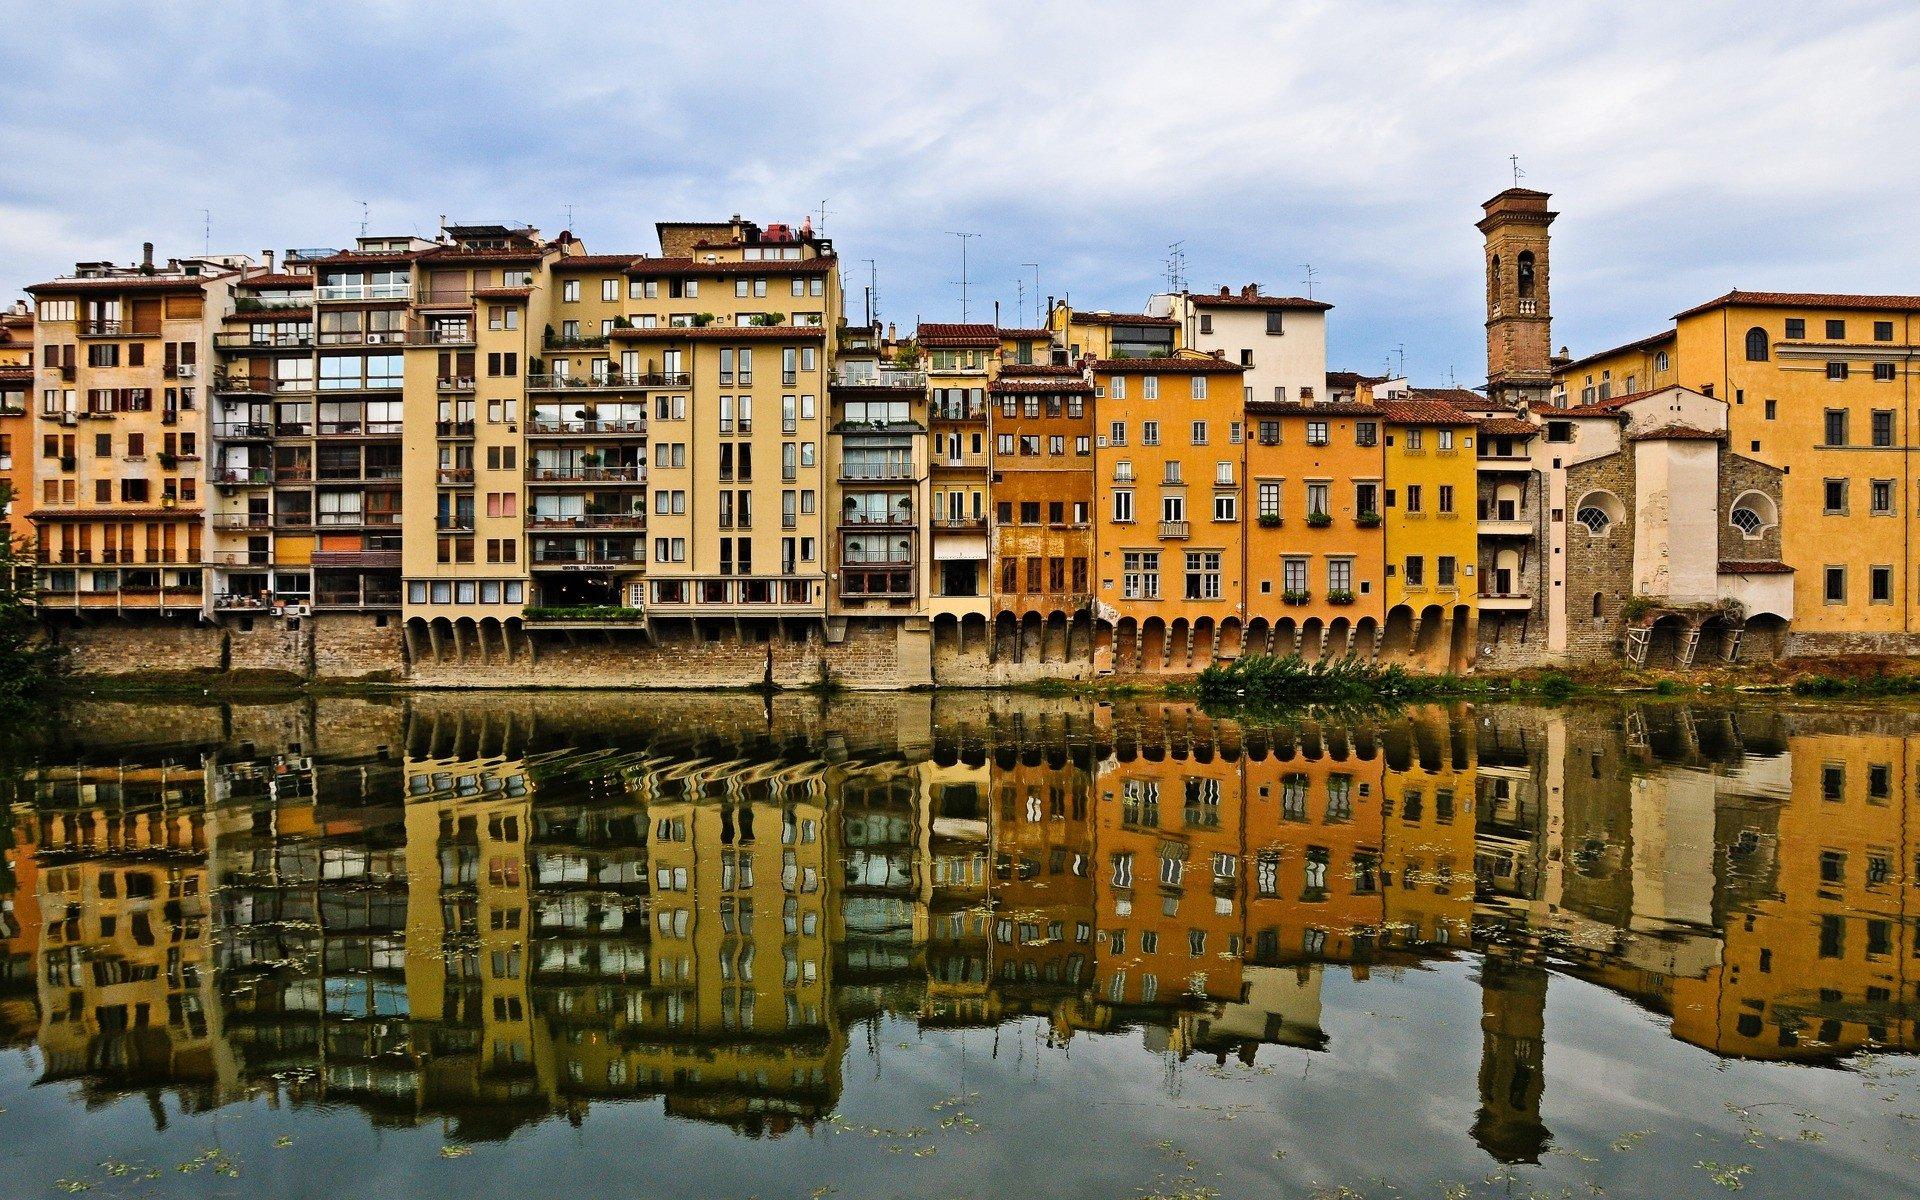 Venice, Italy HD Wallpaper